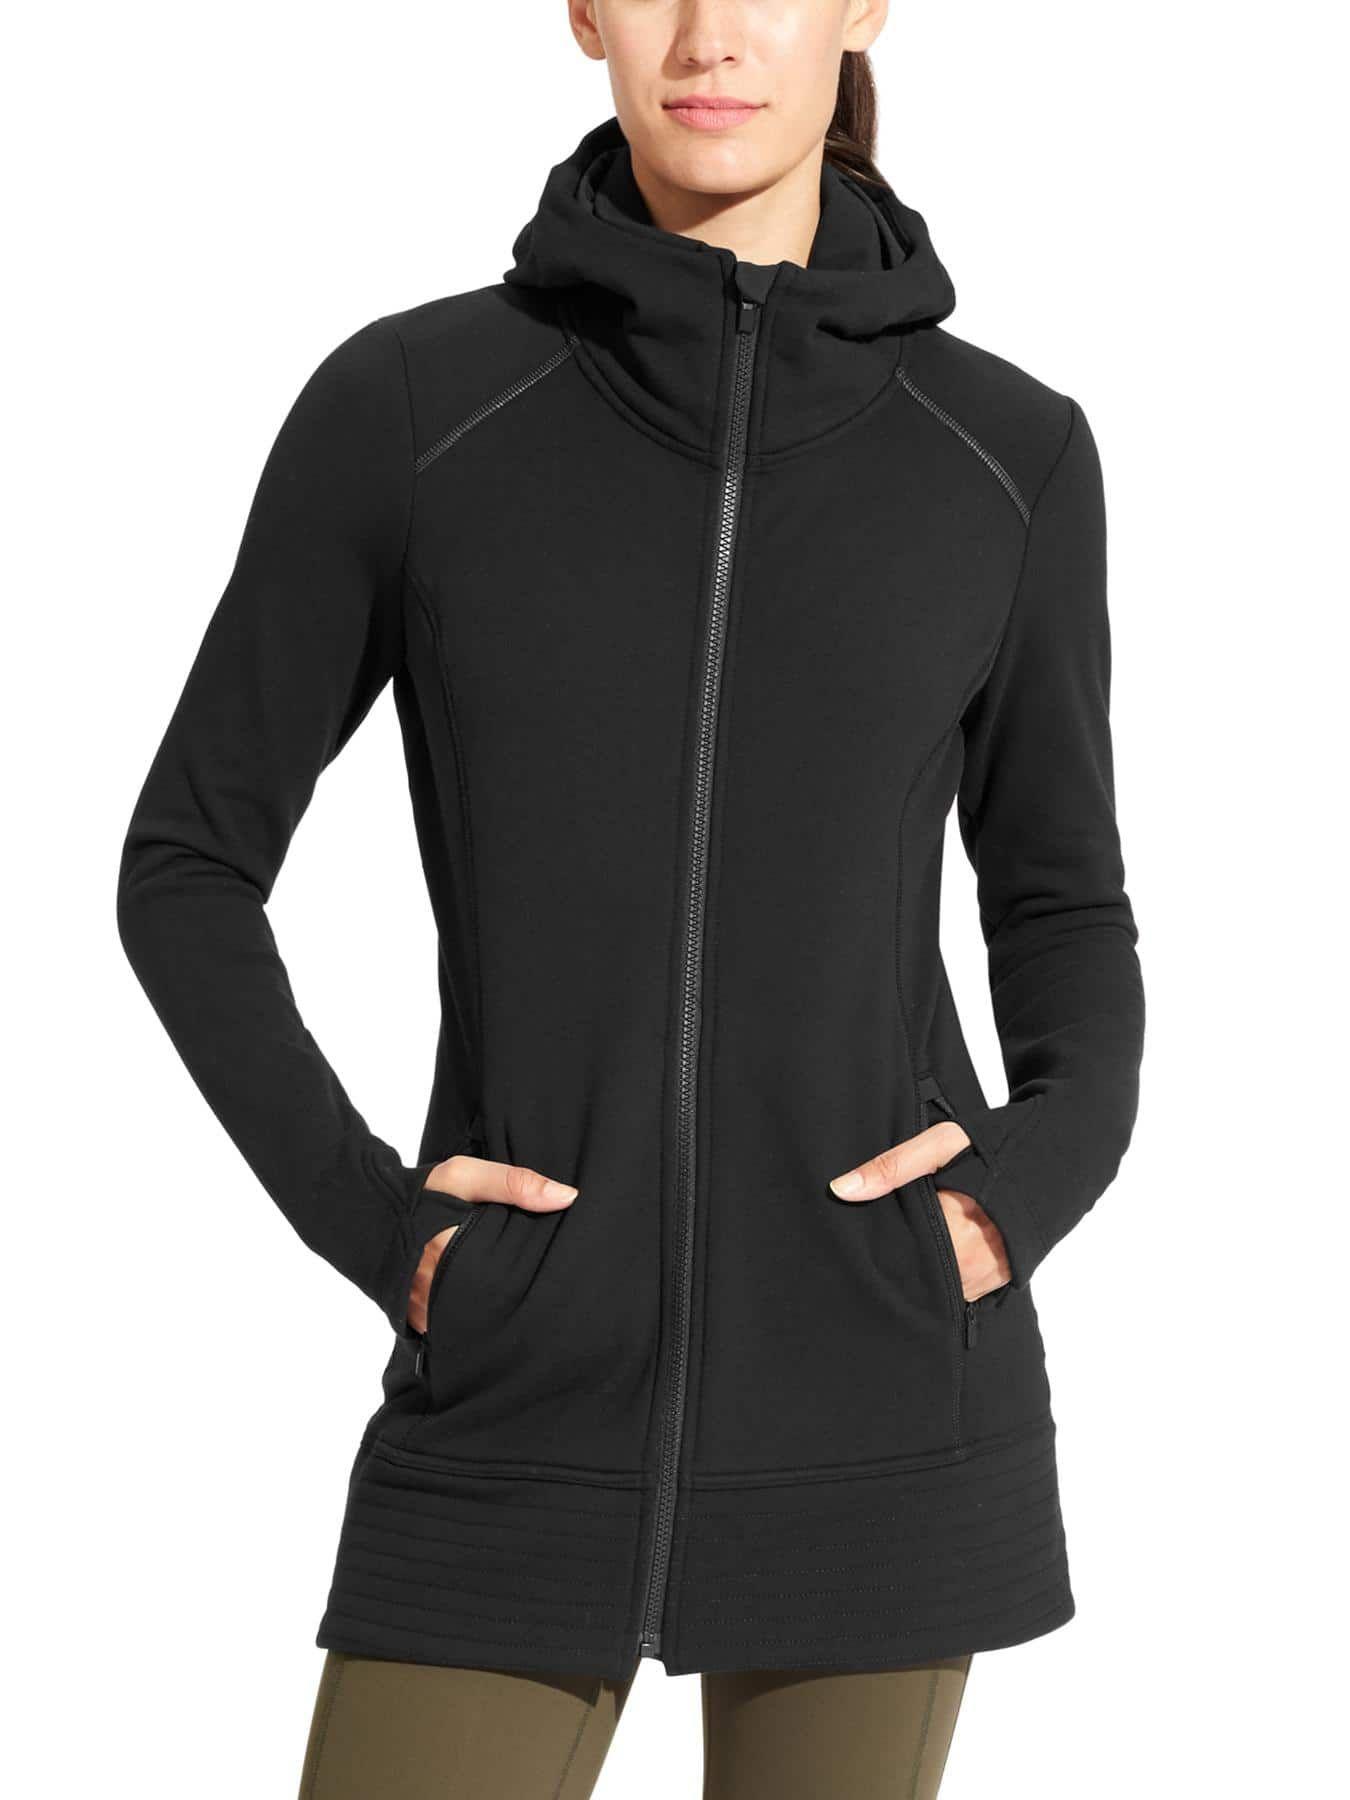 Cya Stronger Hoodie Athleta Clothes Sweatshirts Women Athleisure Outfits [ 1800 x 1350 Pixel ]